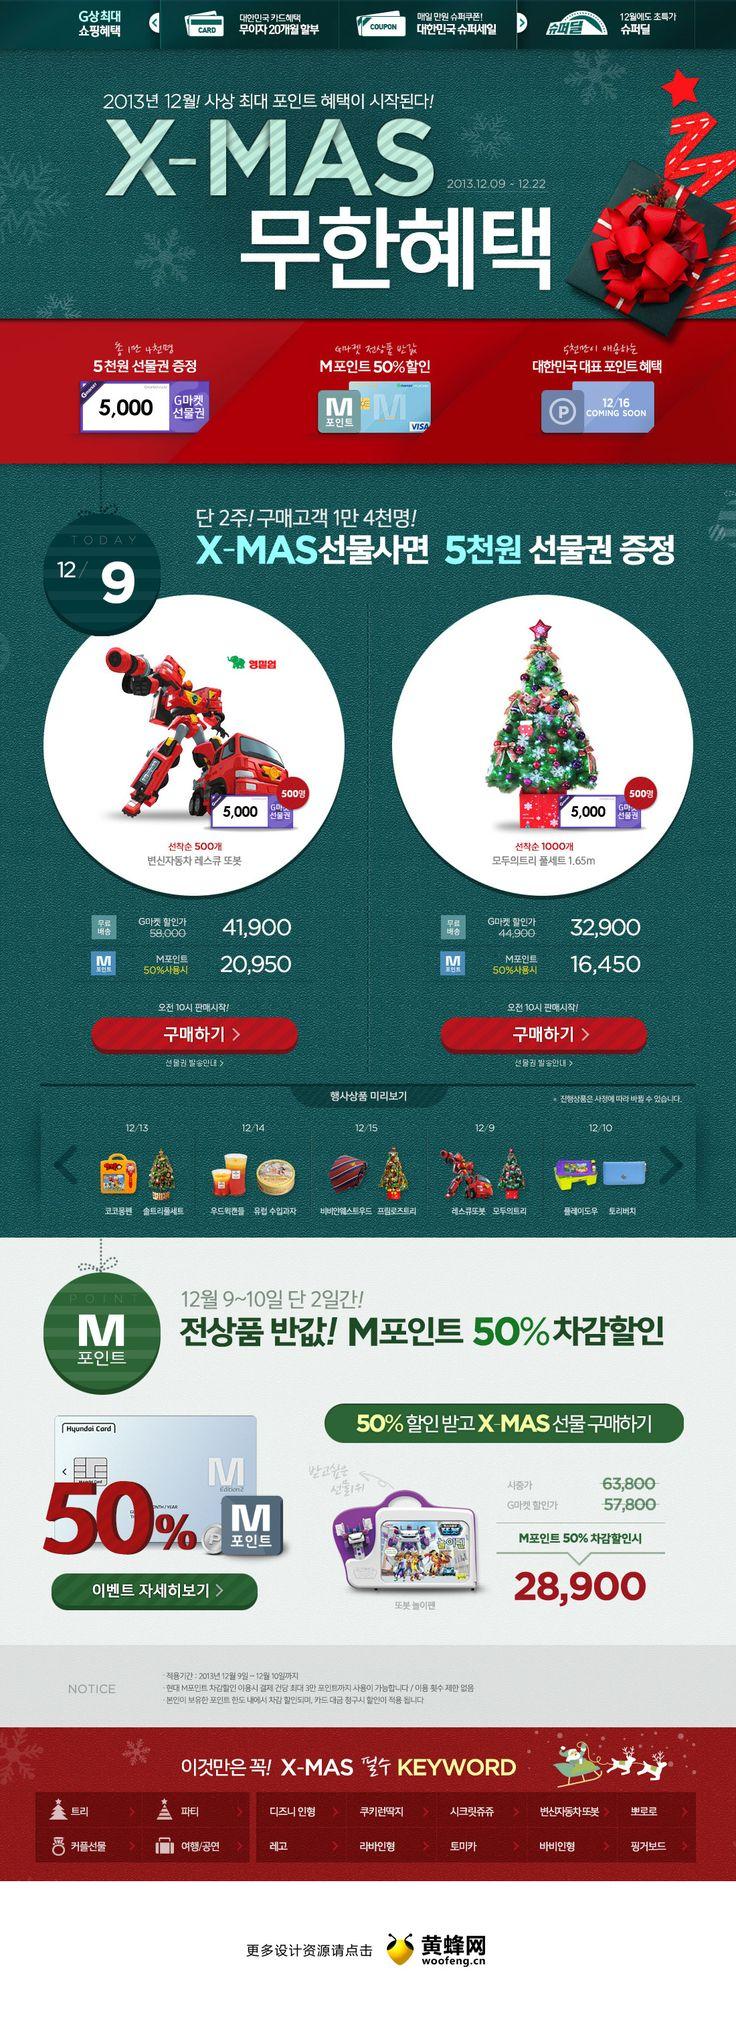 Gmarker 2014圣诞节活动专题页面设计,来源自黄蜂网http://woofeng.cn/